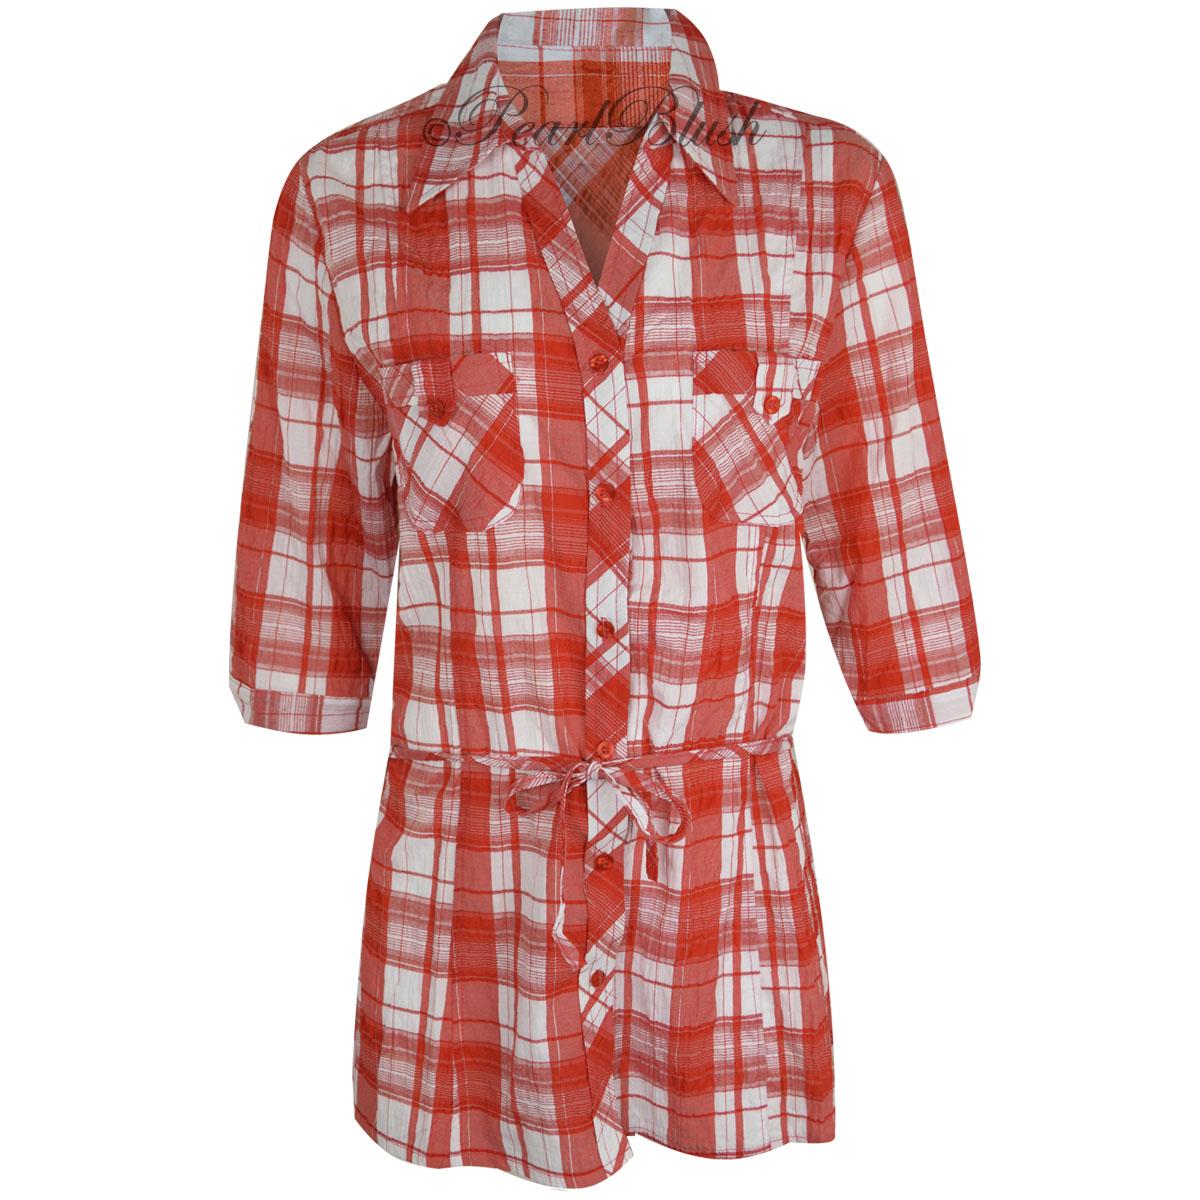 Womens Ladies Plaid Check Shirt 3/4 Sleeve Flannel Button